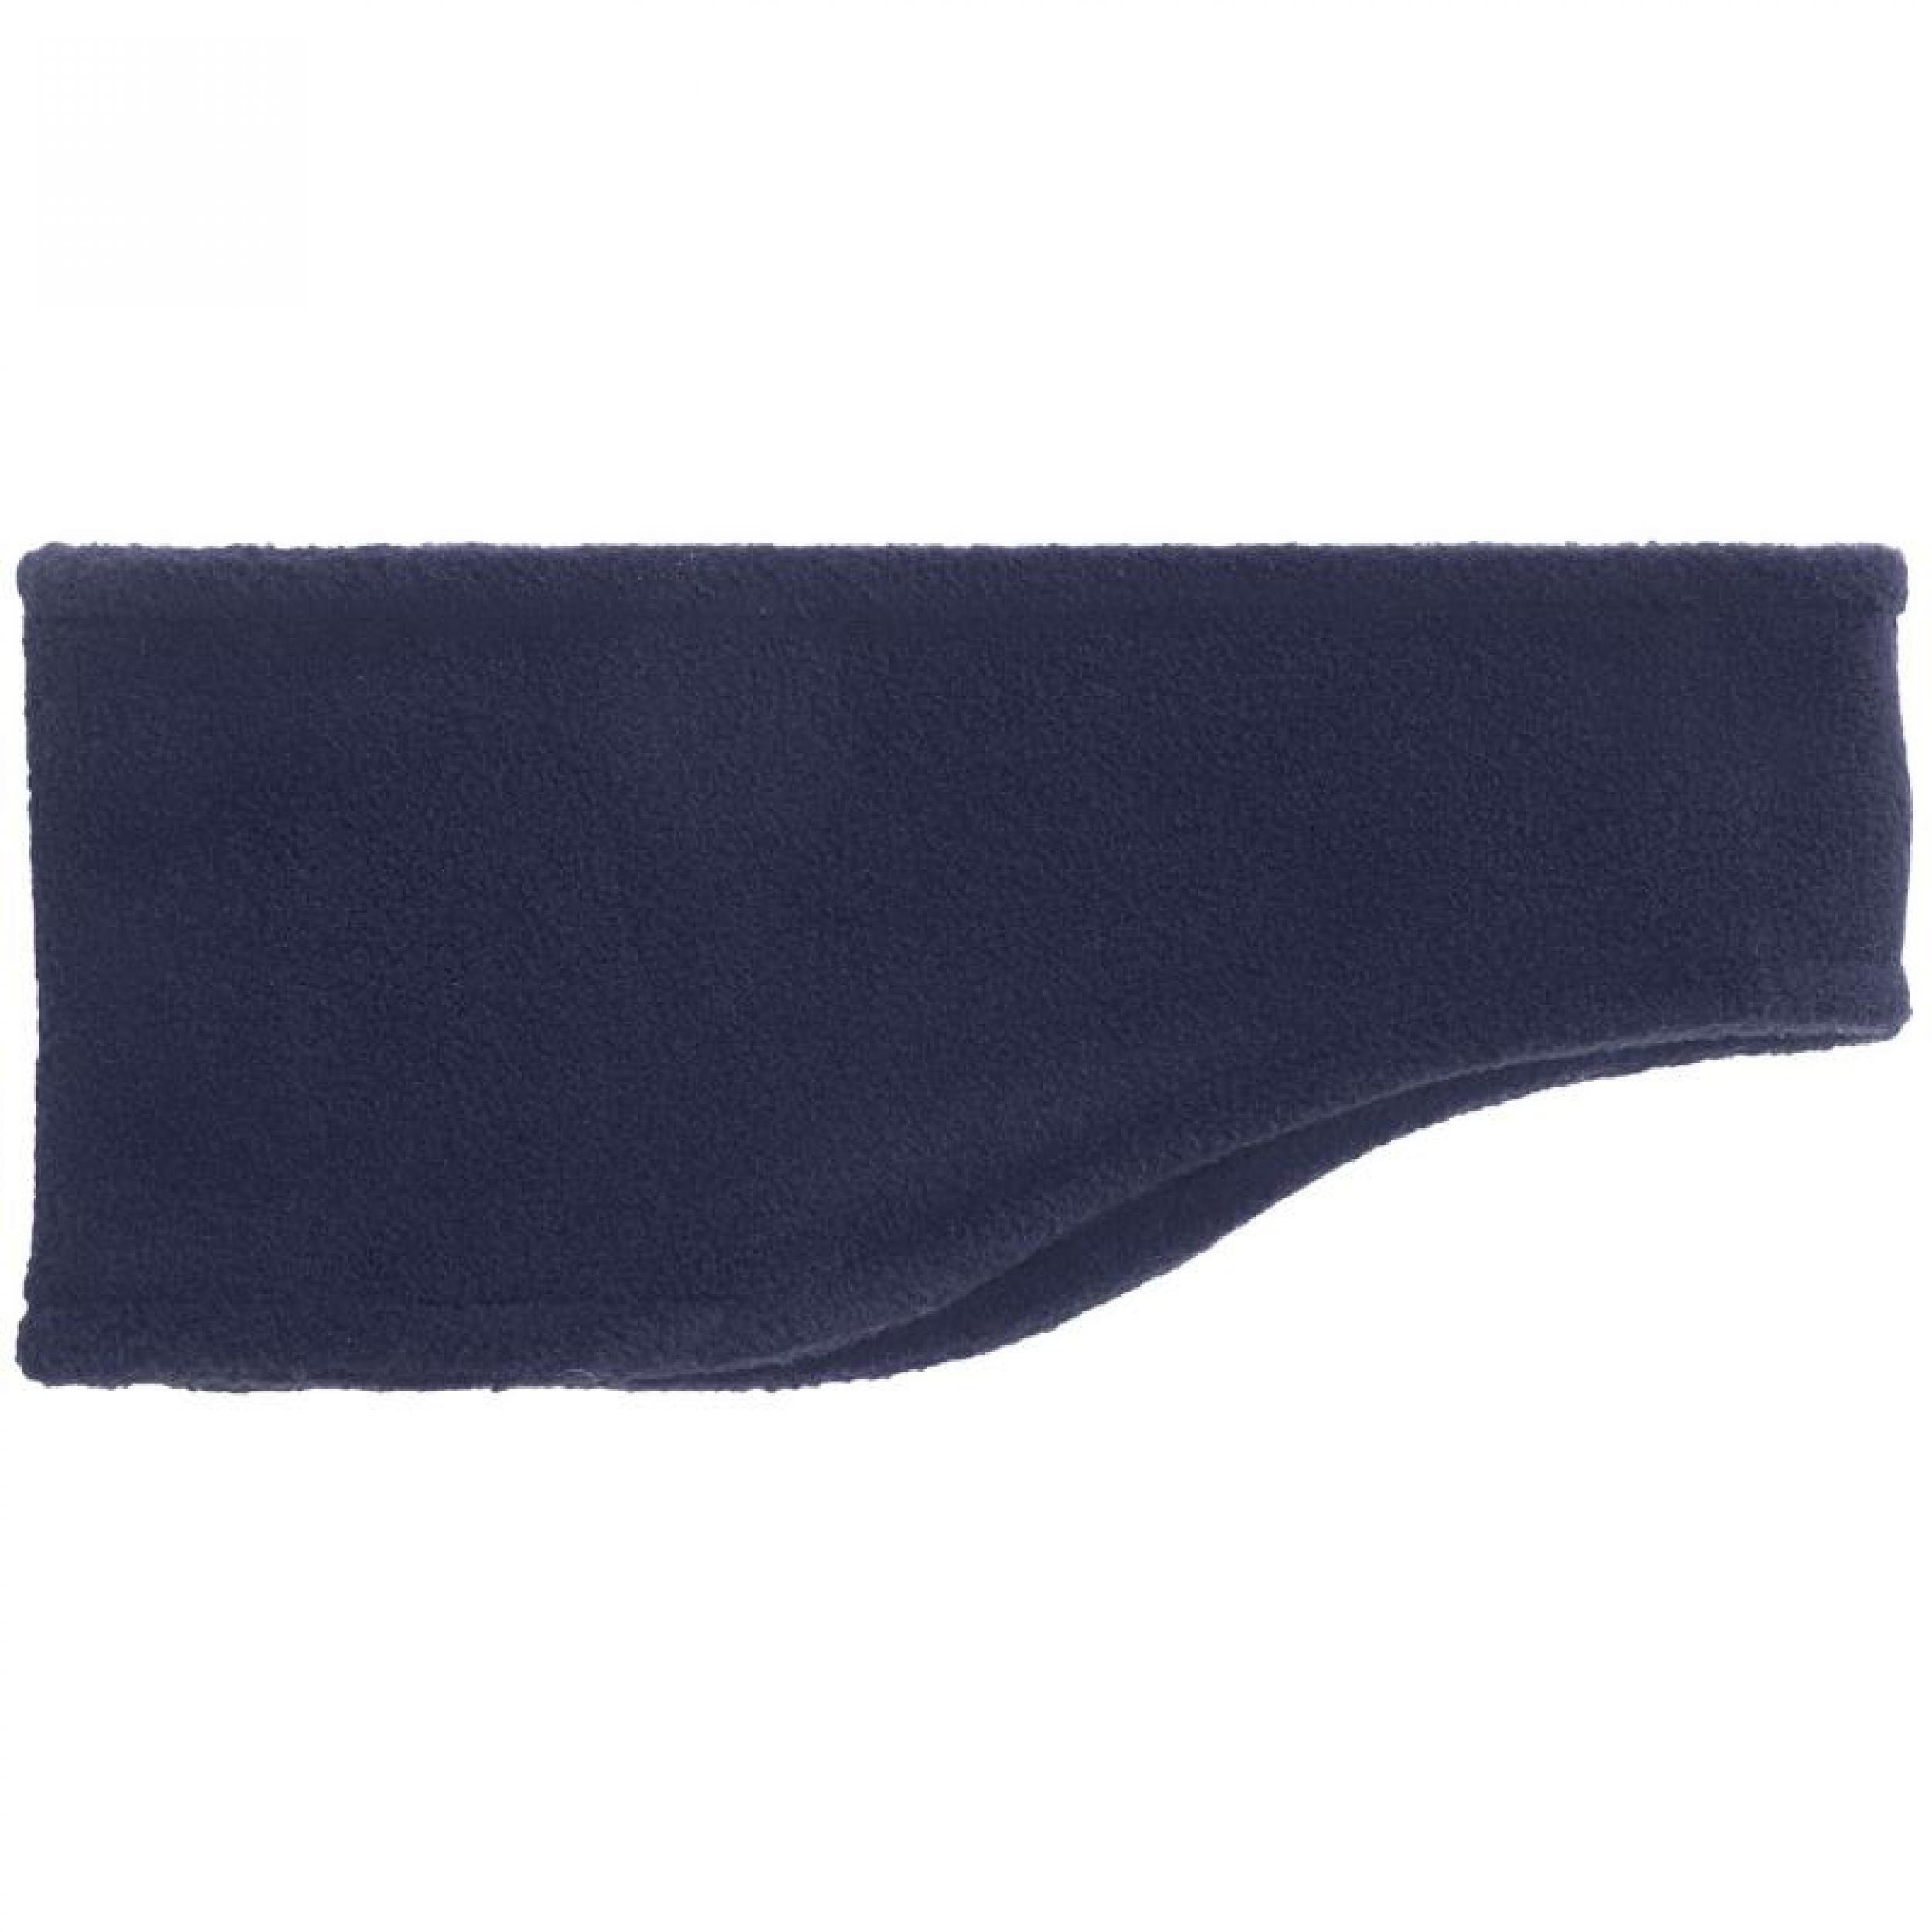 grand-sierra-contoured-microfleece-headband-double-layer-for-men-in-black-p-5893t_04-1500.2.jpg